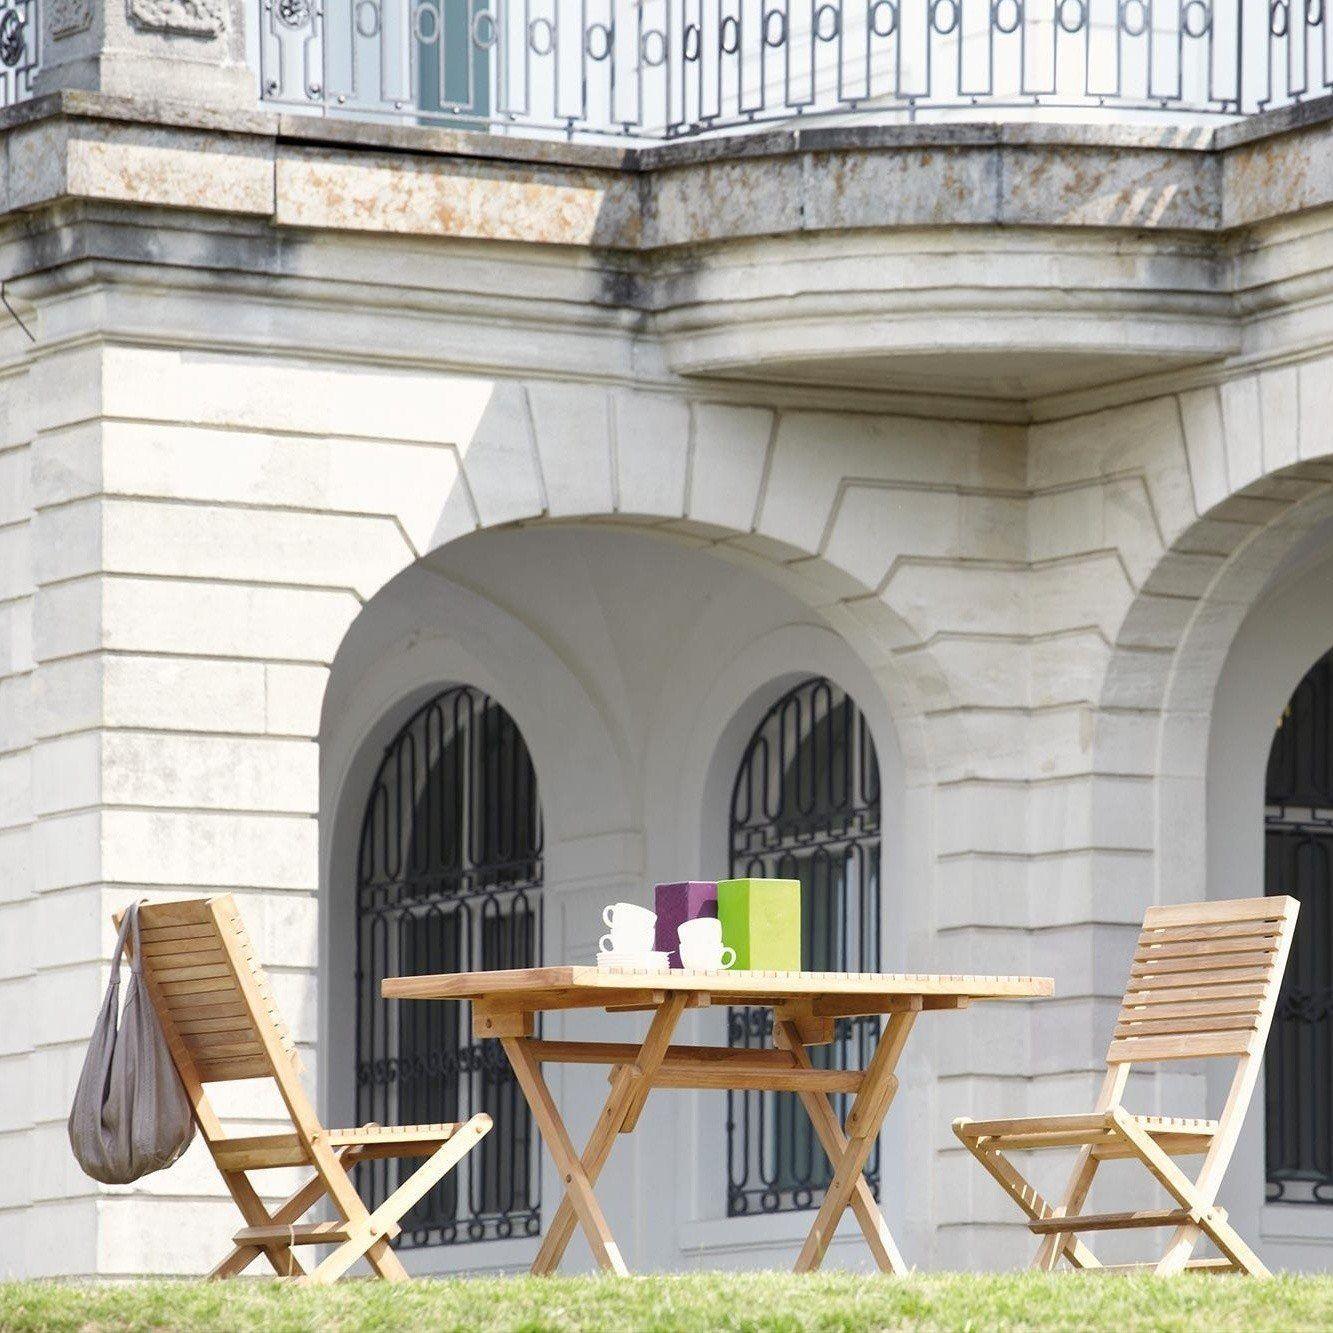 jan kurtz sumatra gartenstuhl klappstuhl ambientedirect. Black Bedroom Furniture Sets. Home Design Ideas